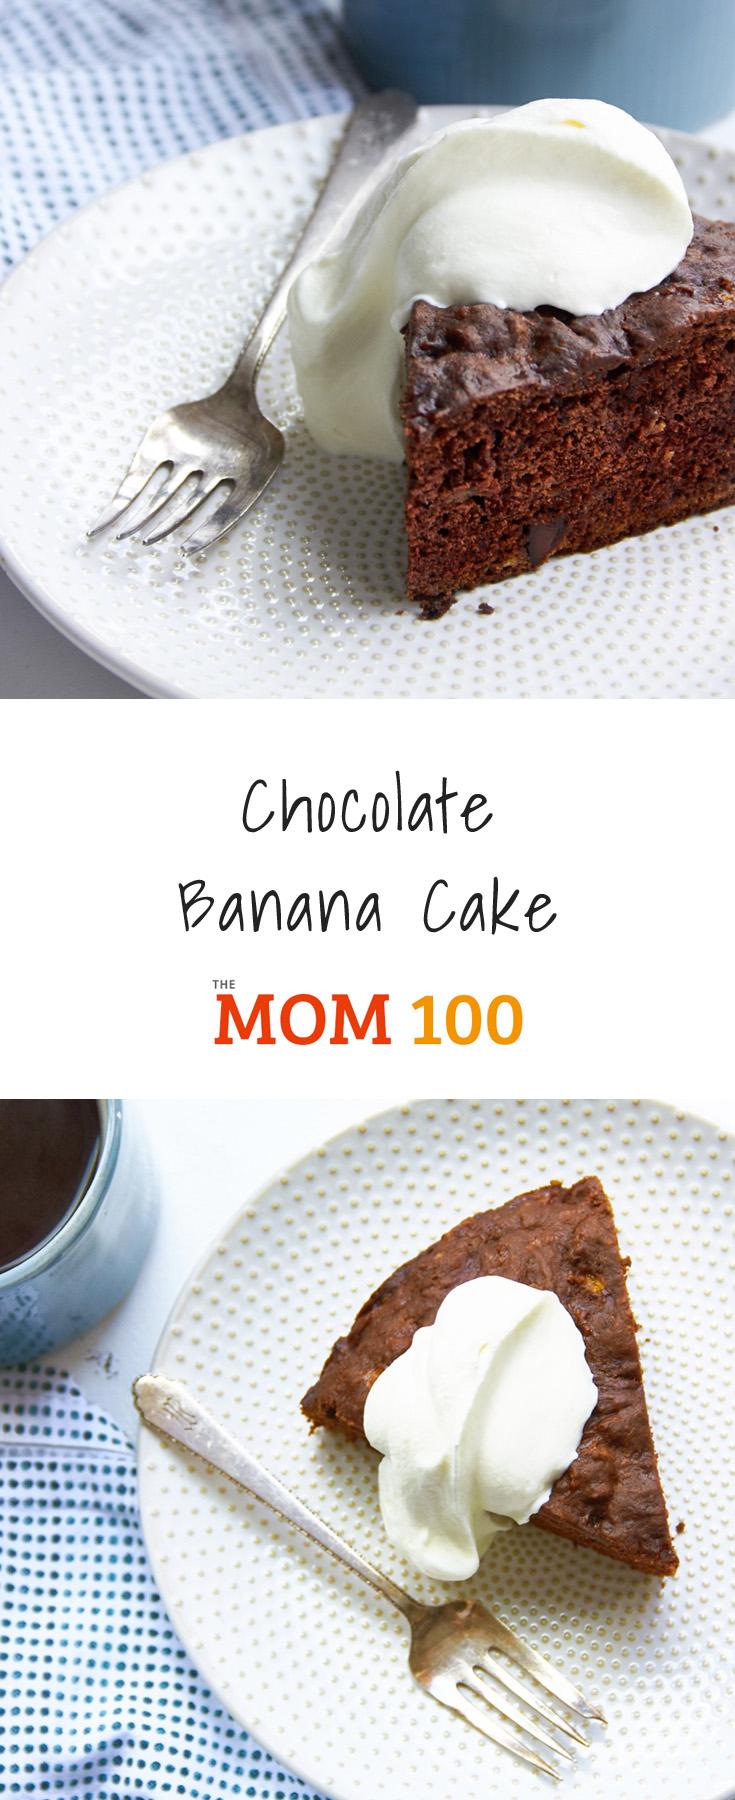 Chocolate banana cake the mom 100 the mom 100 chocolate banana cake forumfinder Choice Image